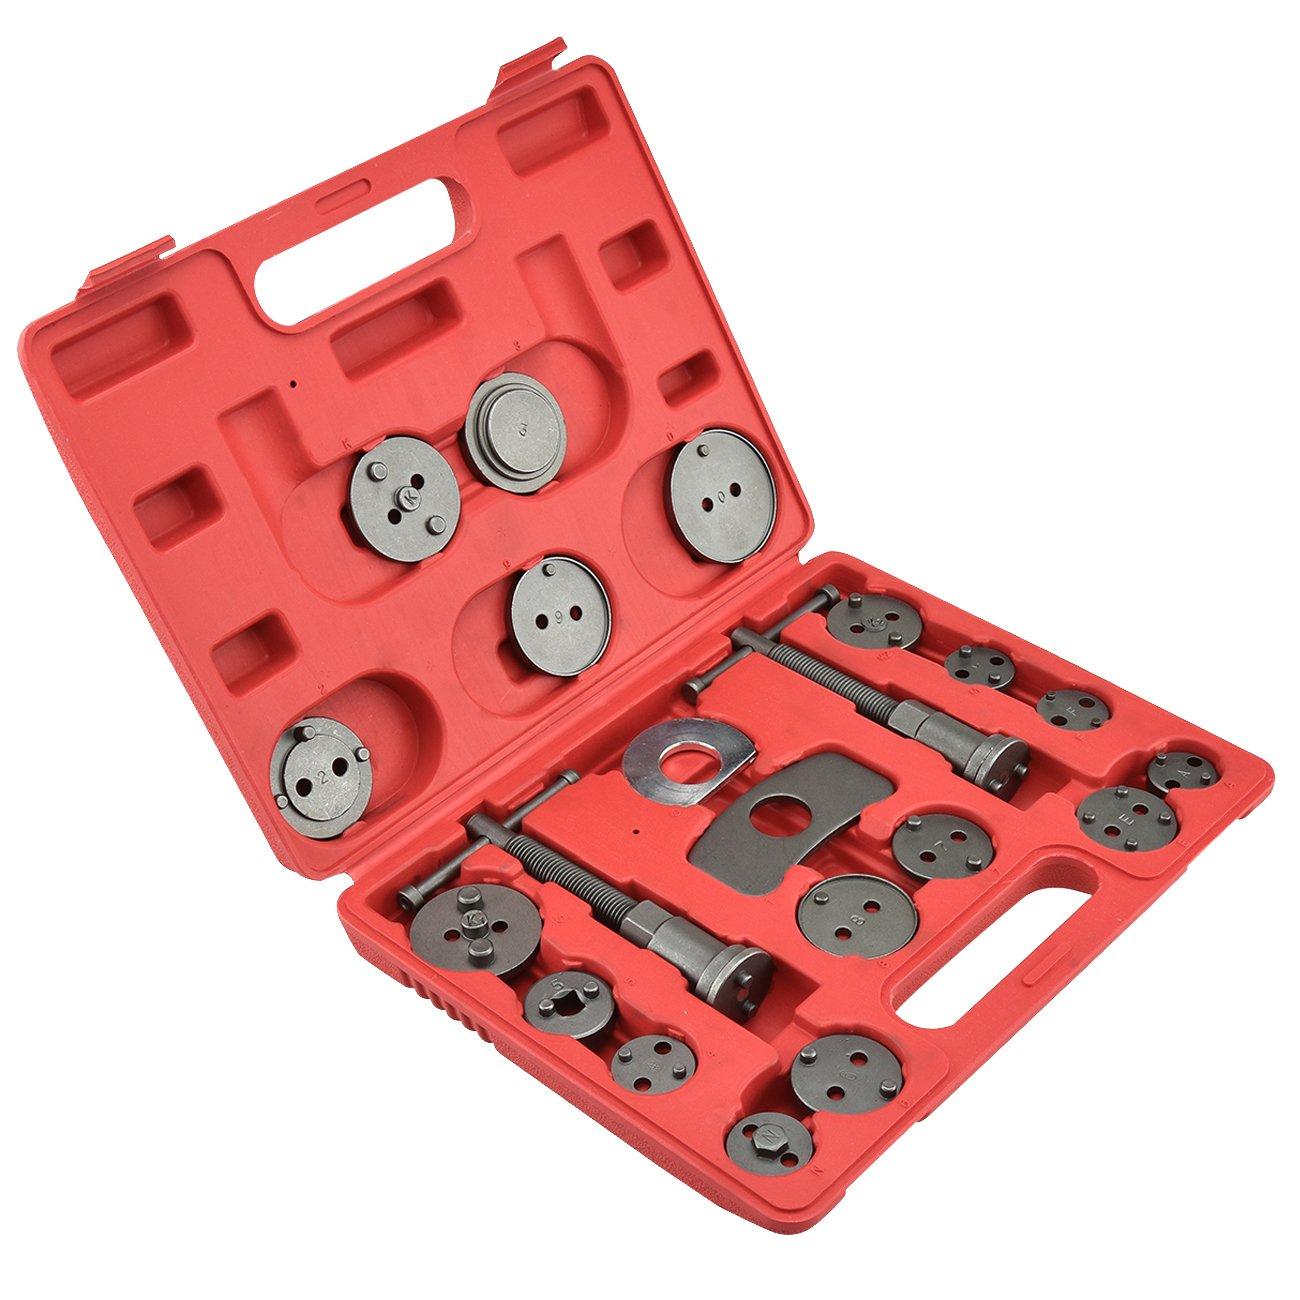 21 Piece Tool Kit Car/Truck Disc Brake Caliper Rewind Wind Back Auto Tool Set Kit for Piston Pad Disc Brake Car Truck Mechanics by Voluker (Image #2)